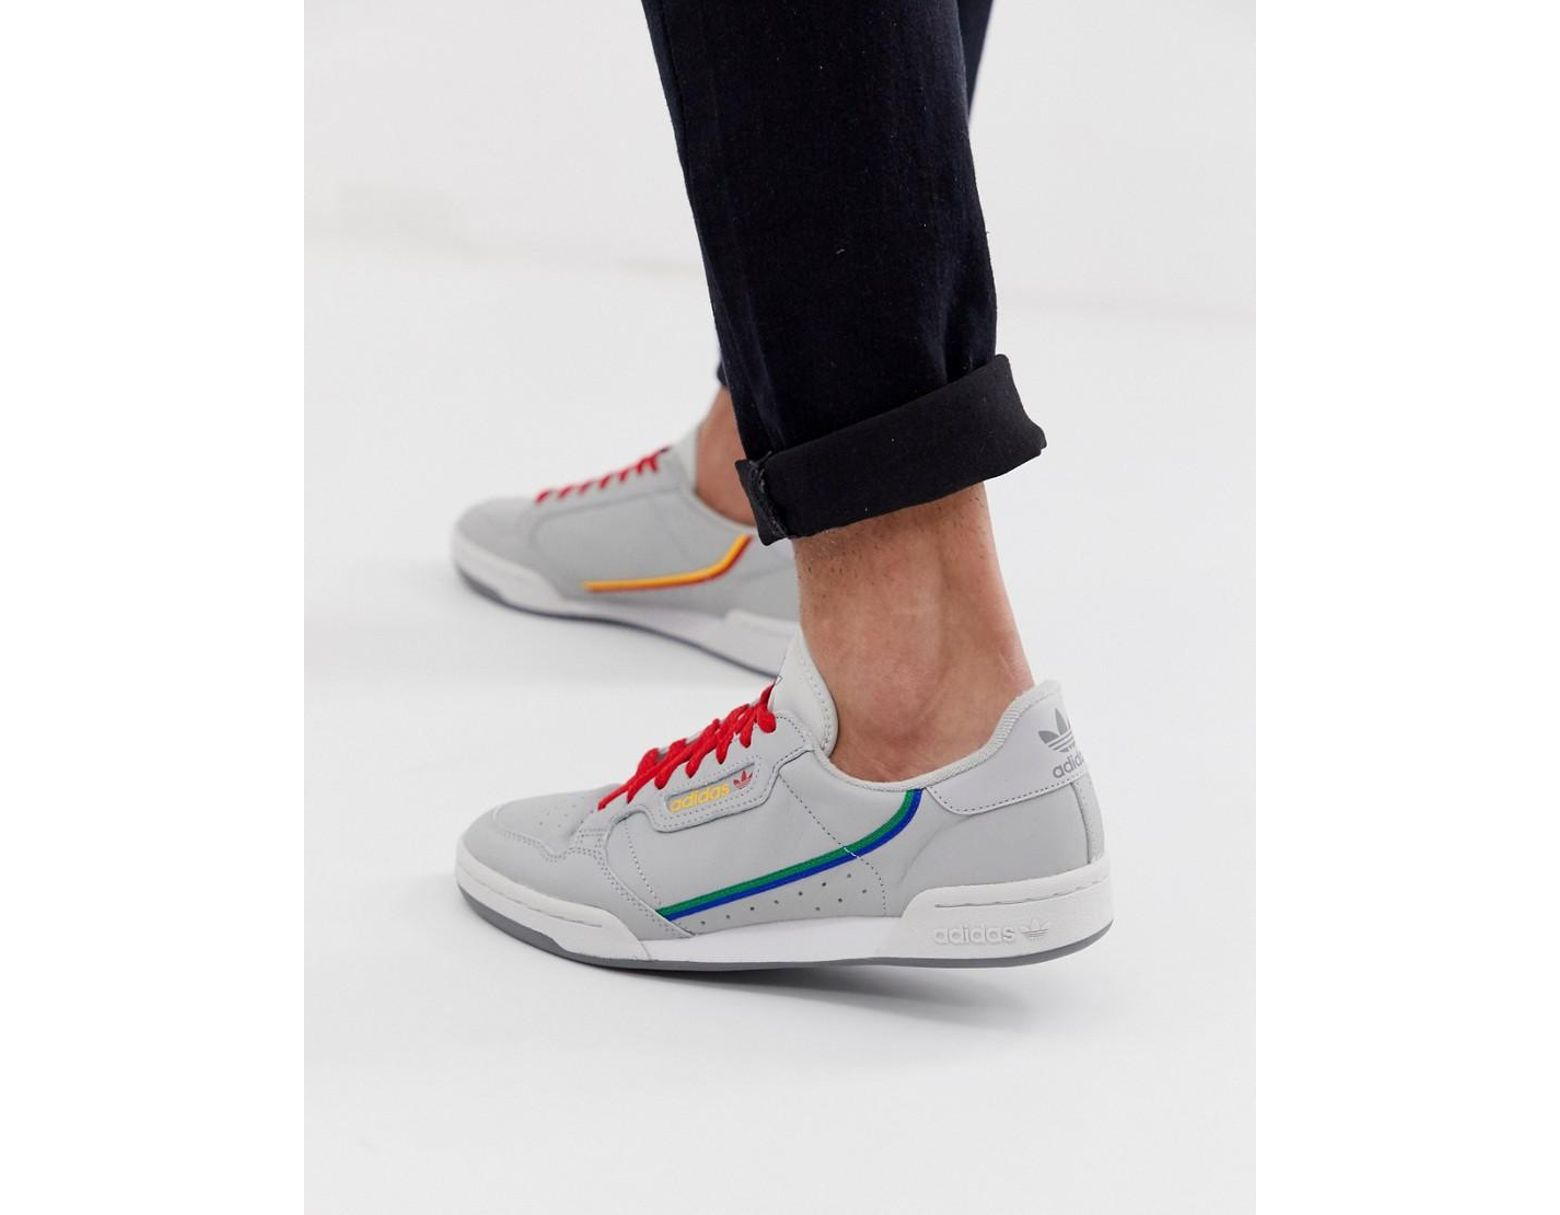 7dddf4a4d67 adidas Originals Continental 80 Trainers Grey Cg7128 in Gray for Men - Lyst